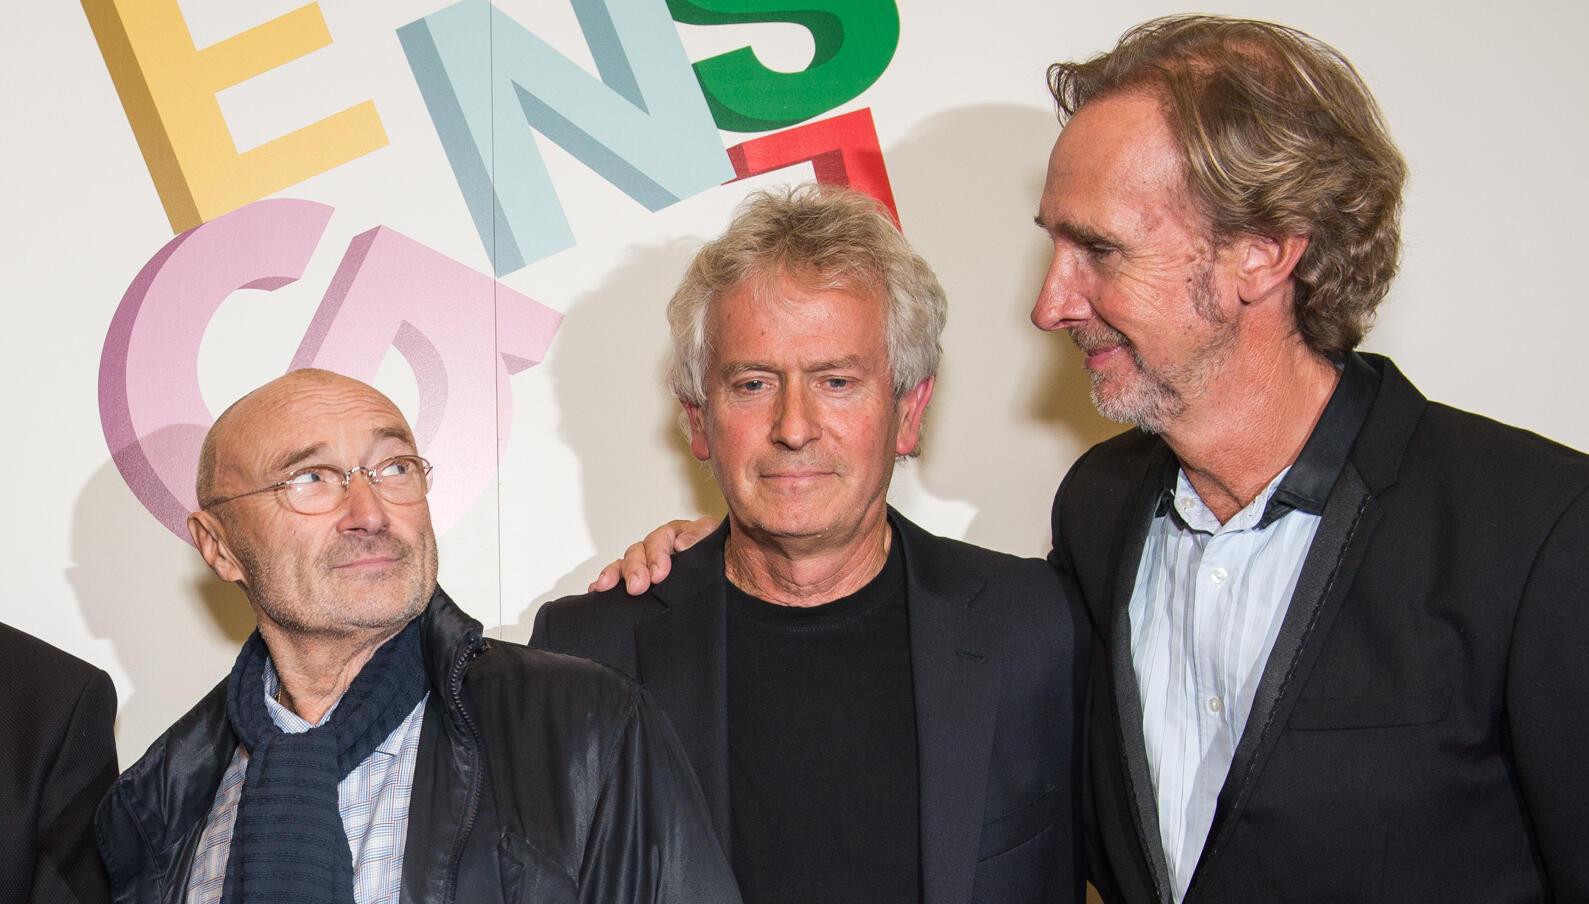 Genesis Ignites Reunion Hopes When Three Members Seen At Knicks Game